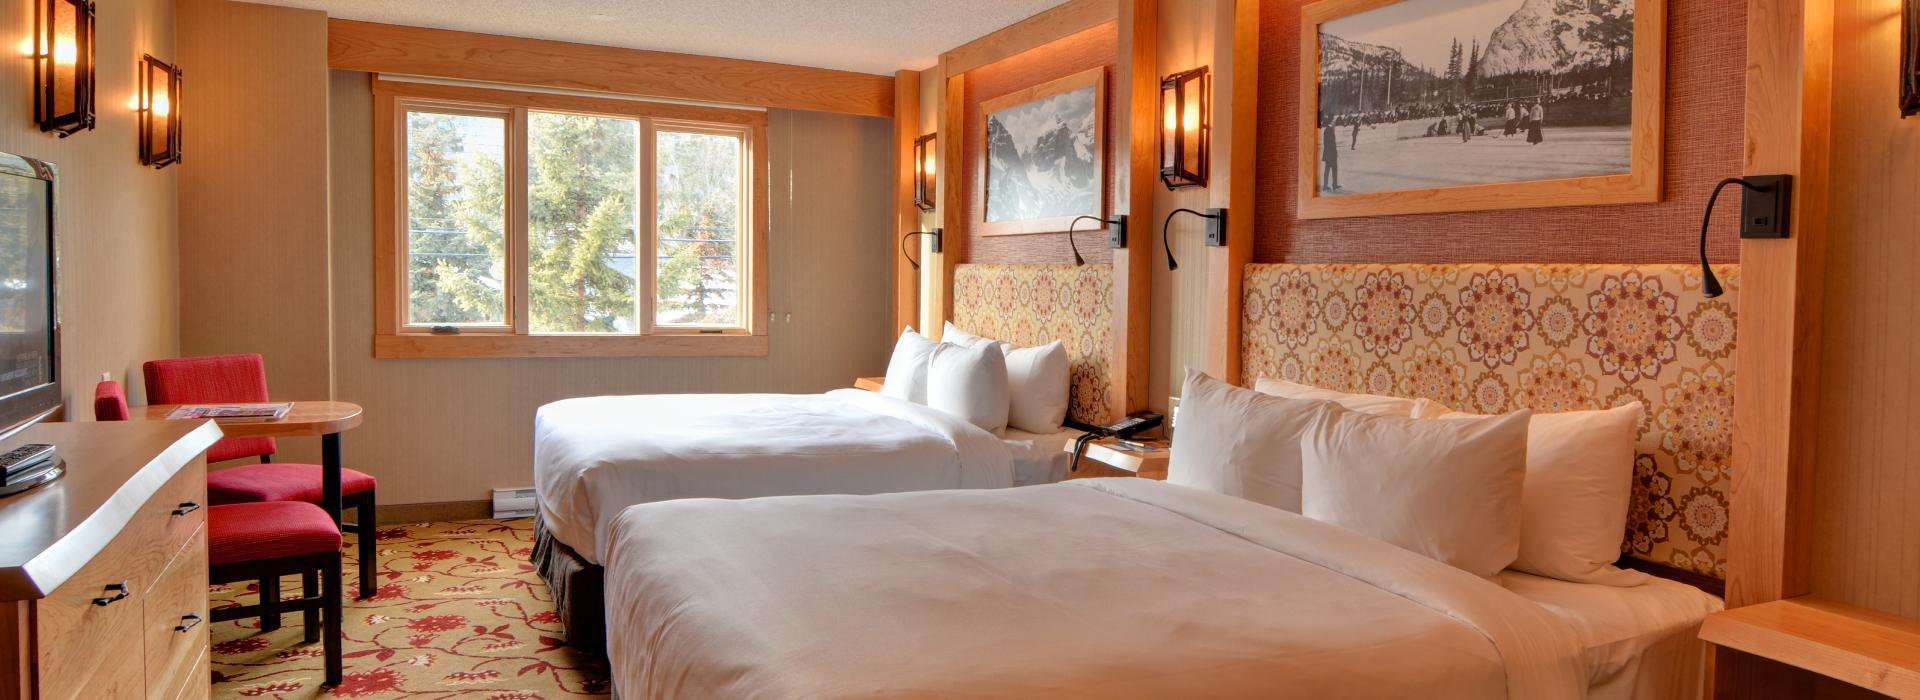 Banff Ptarmigan Inn Rooms